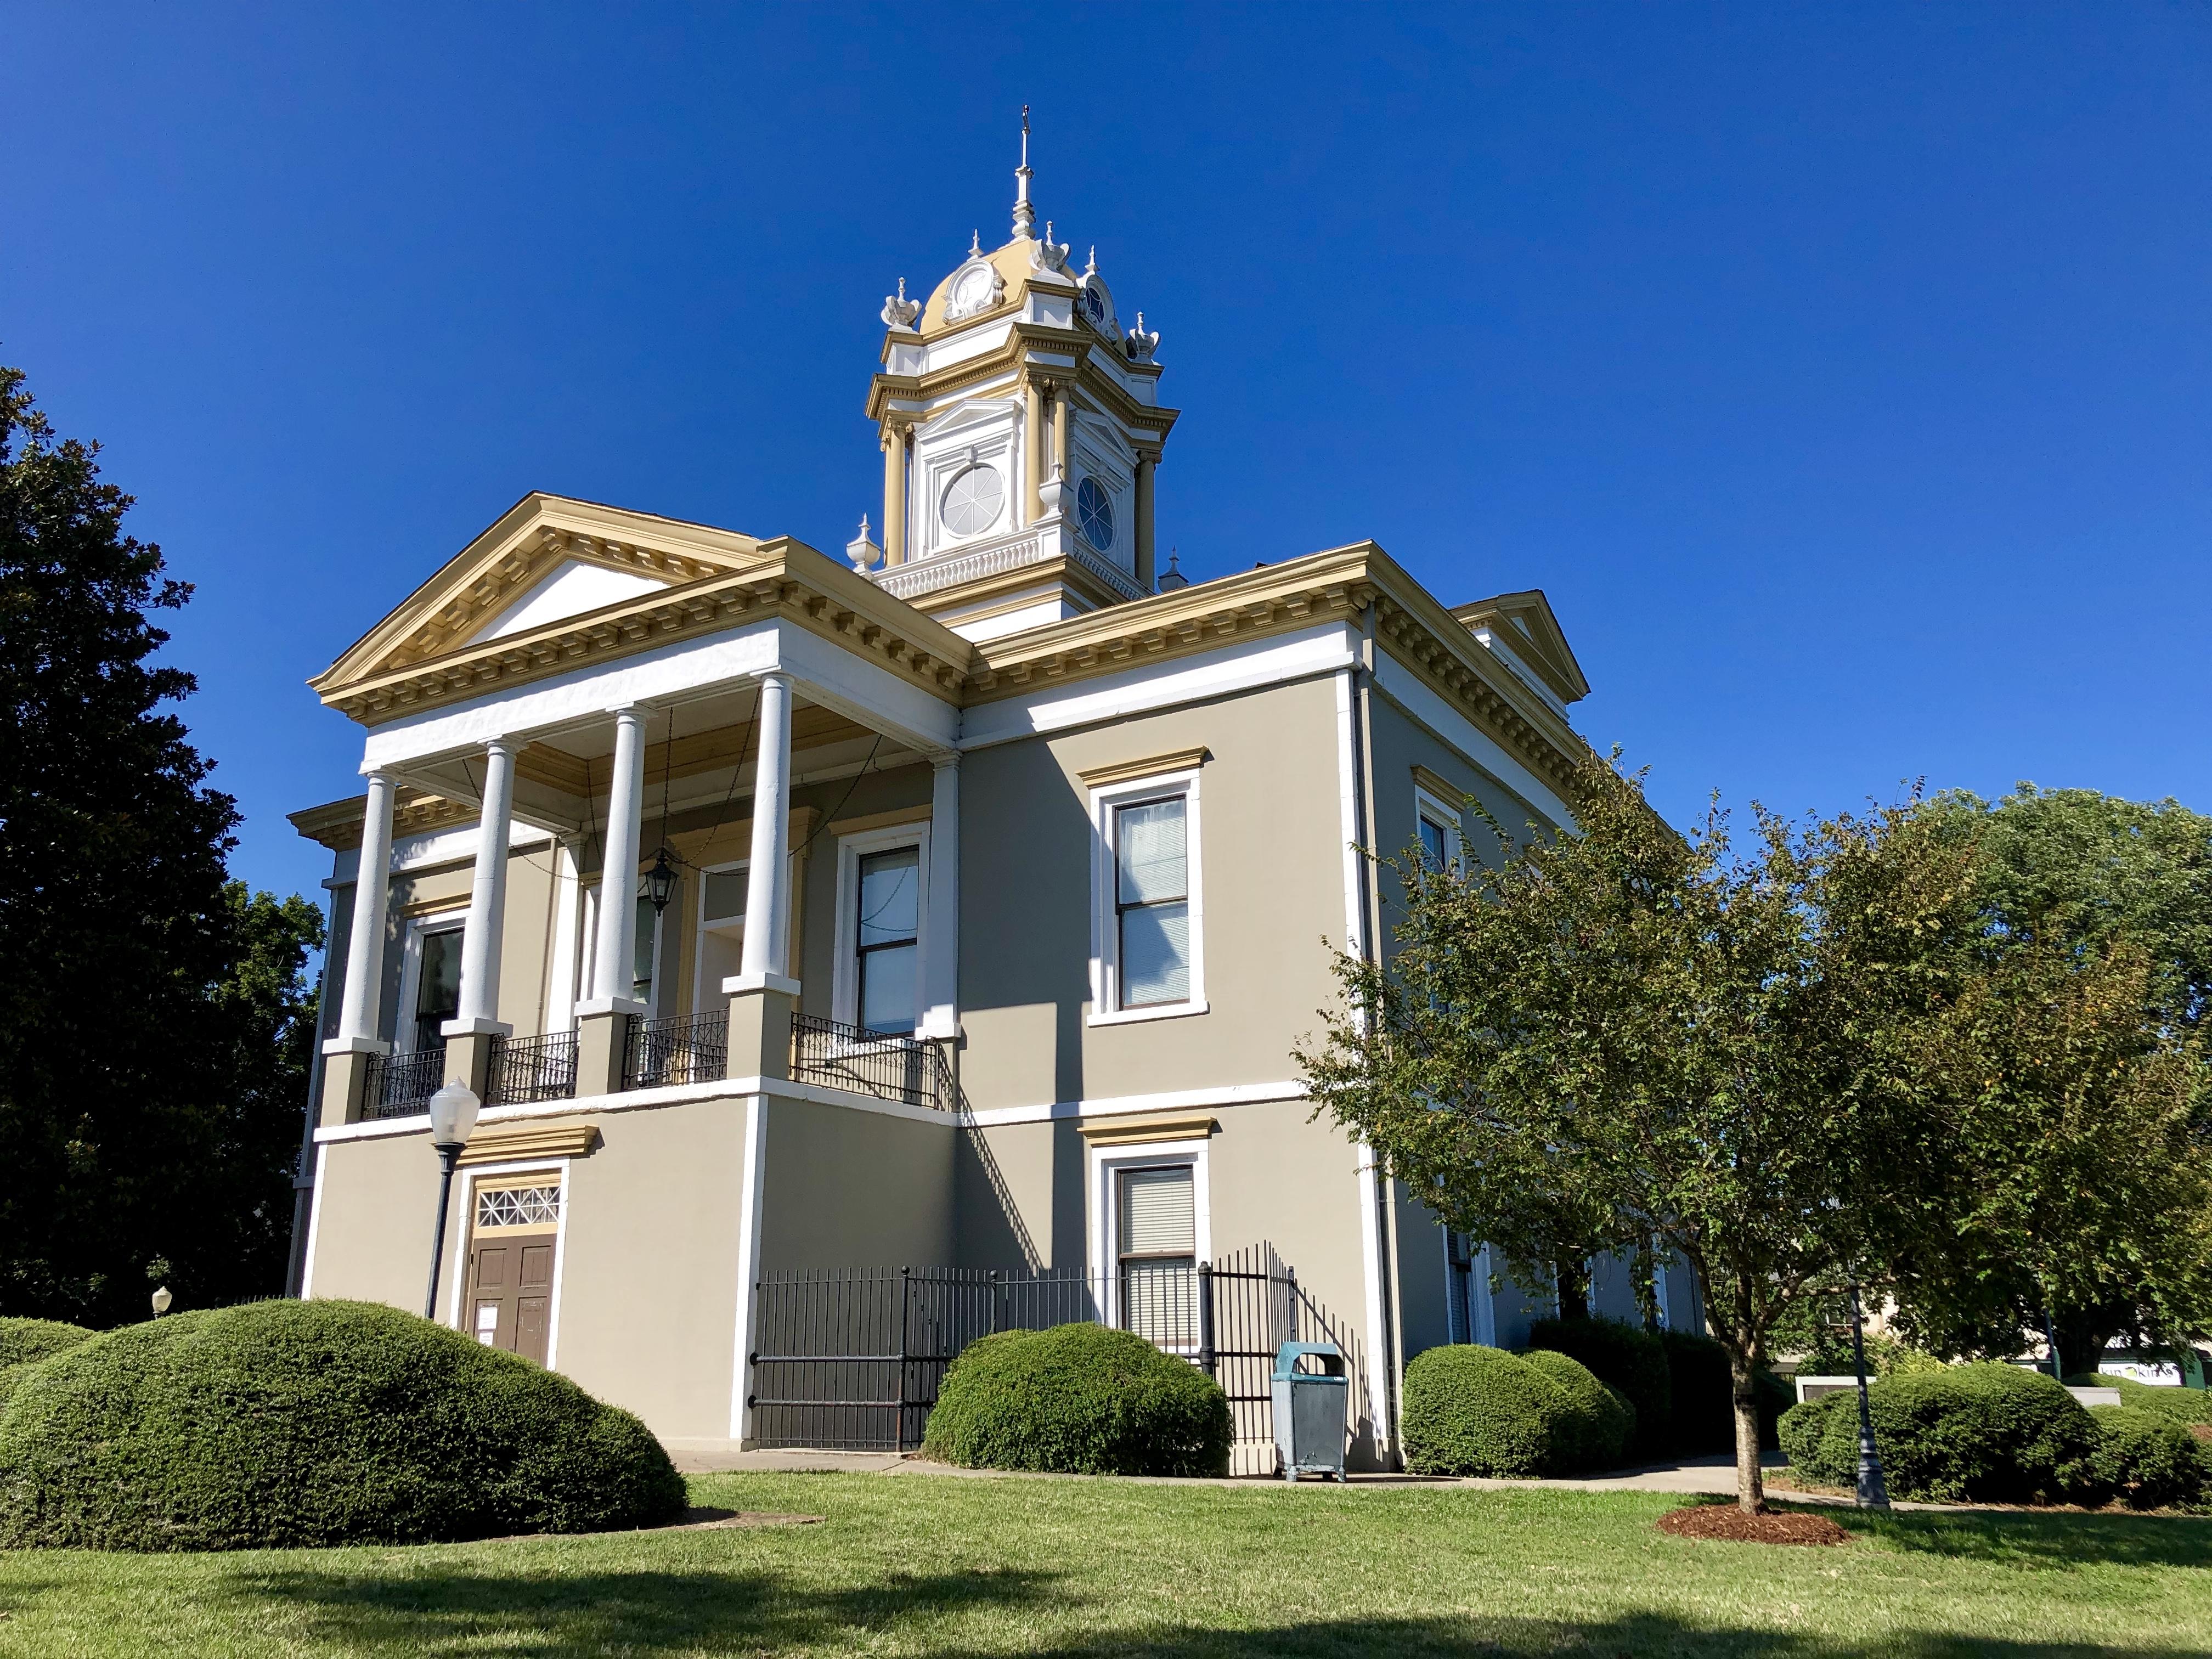 Burke_County_Courthouse,_Morganton,_NC.j